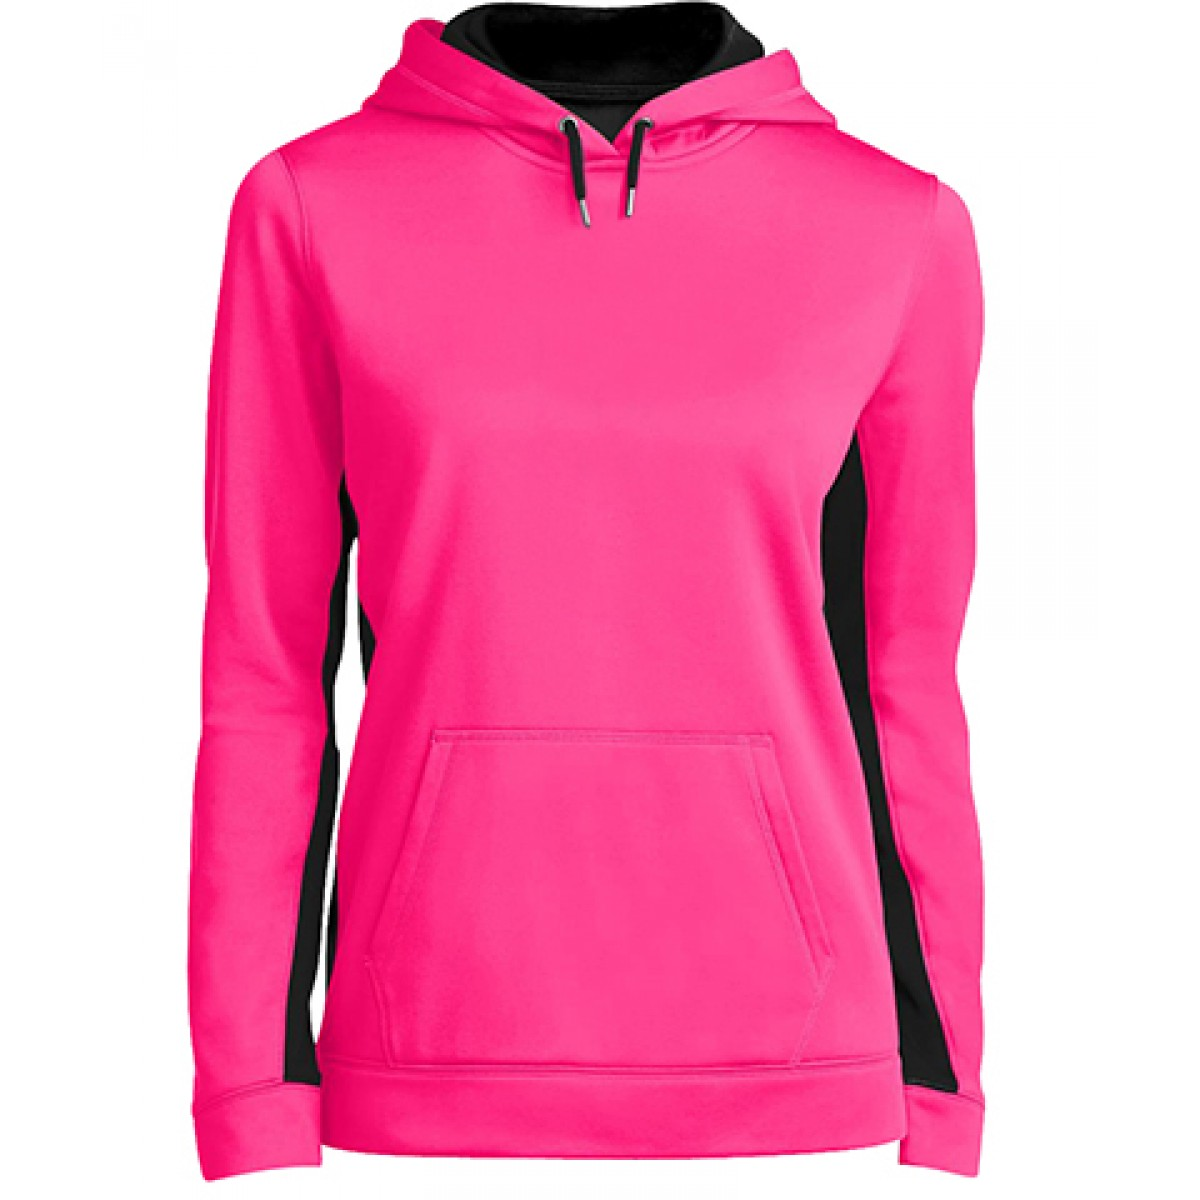 Ladies Colorblock Hooded Pullover-Neon Pink Black-M